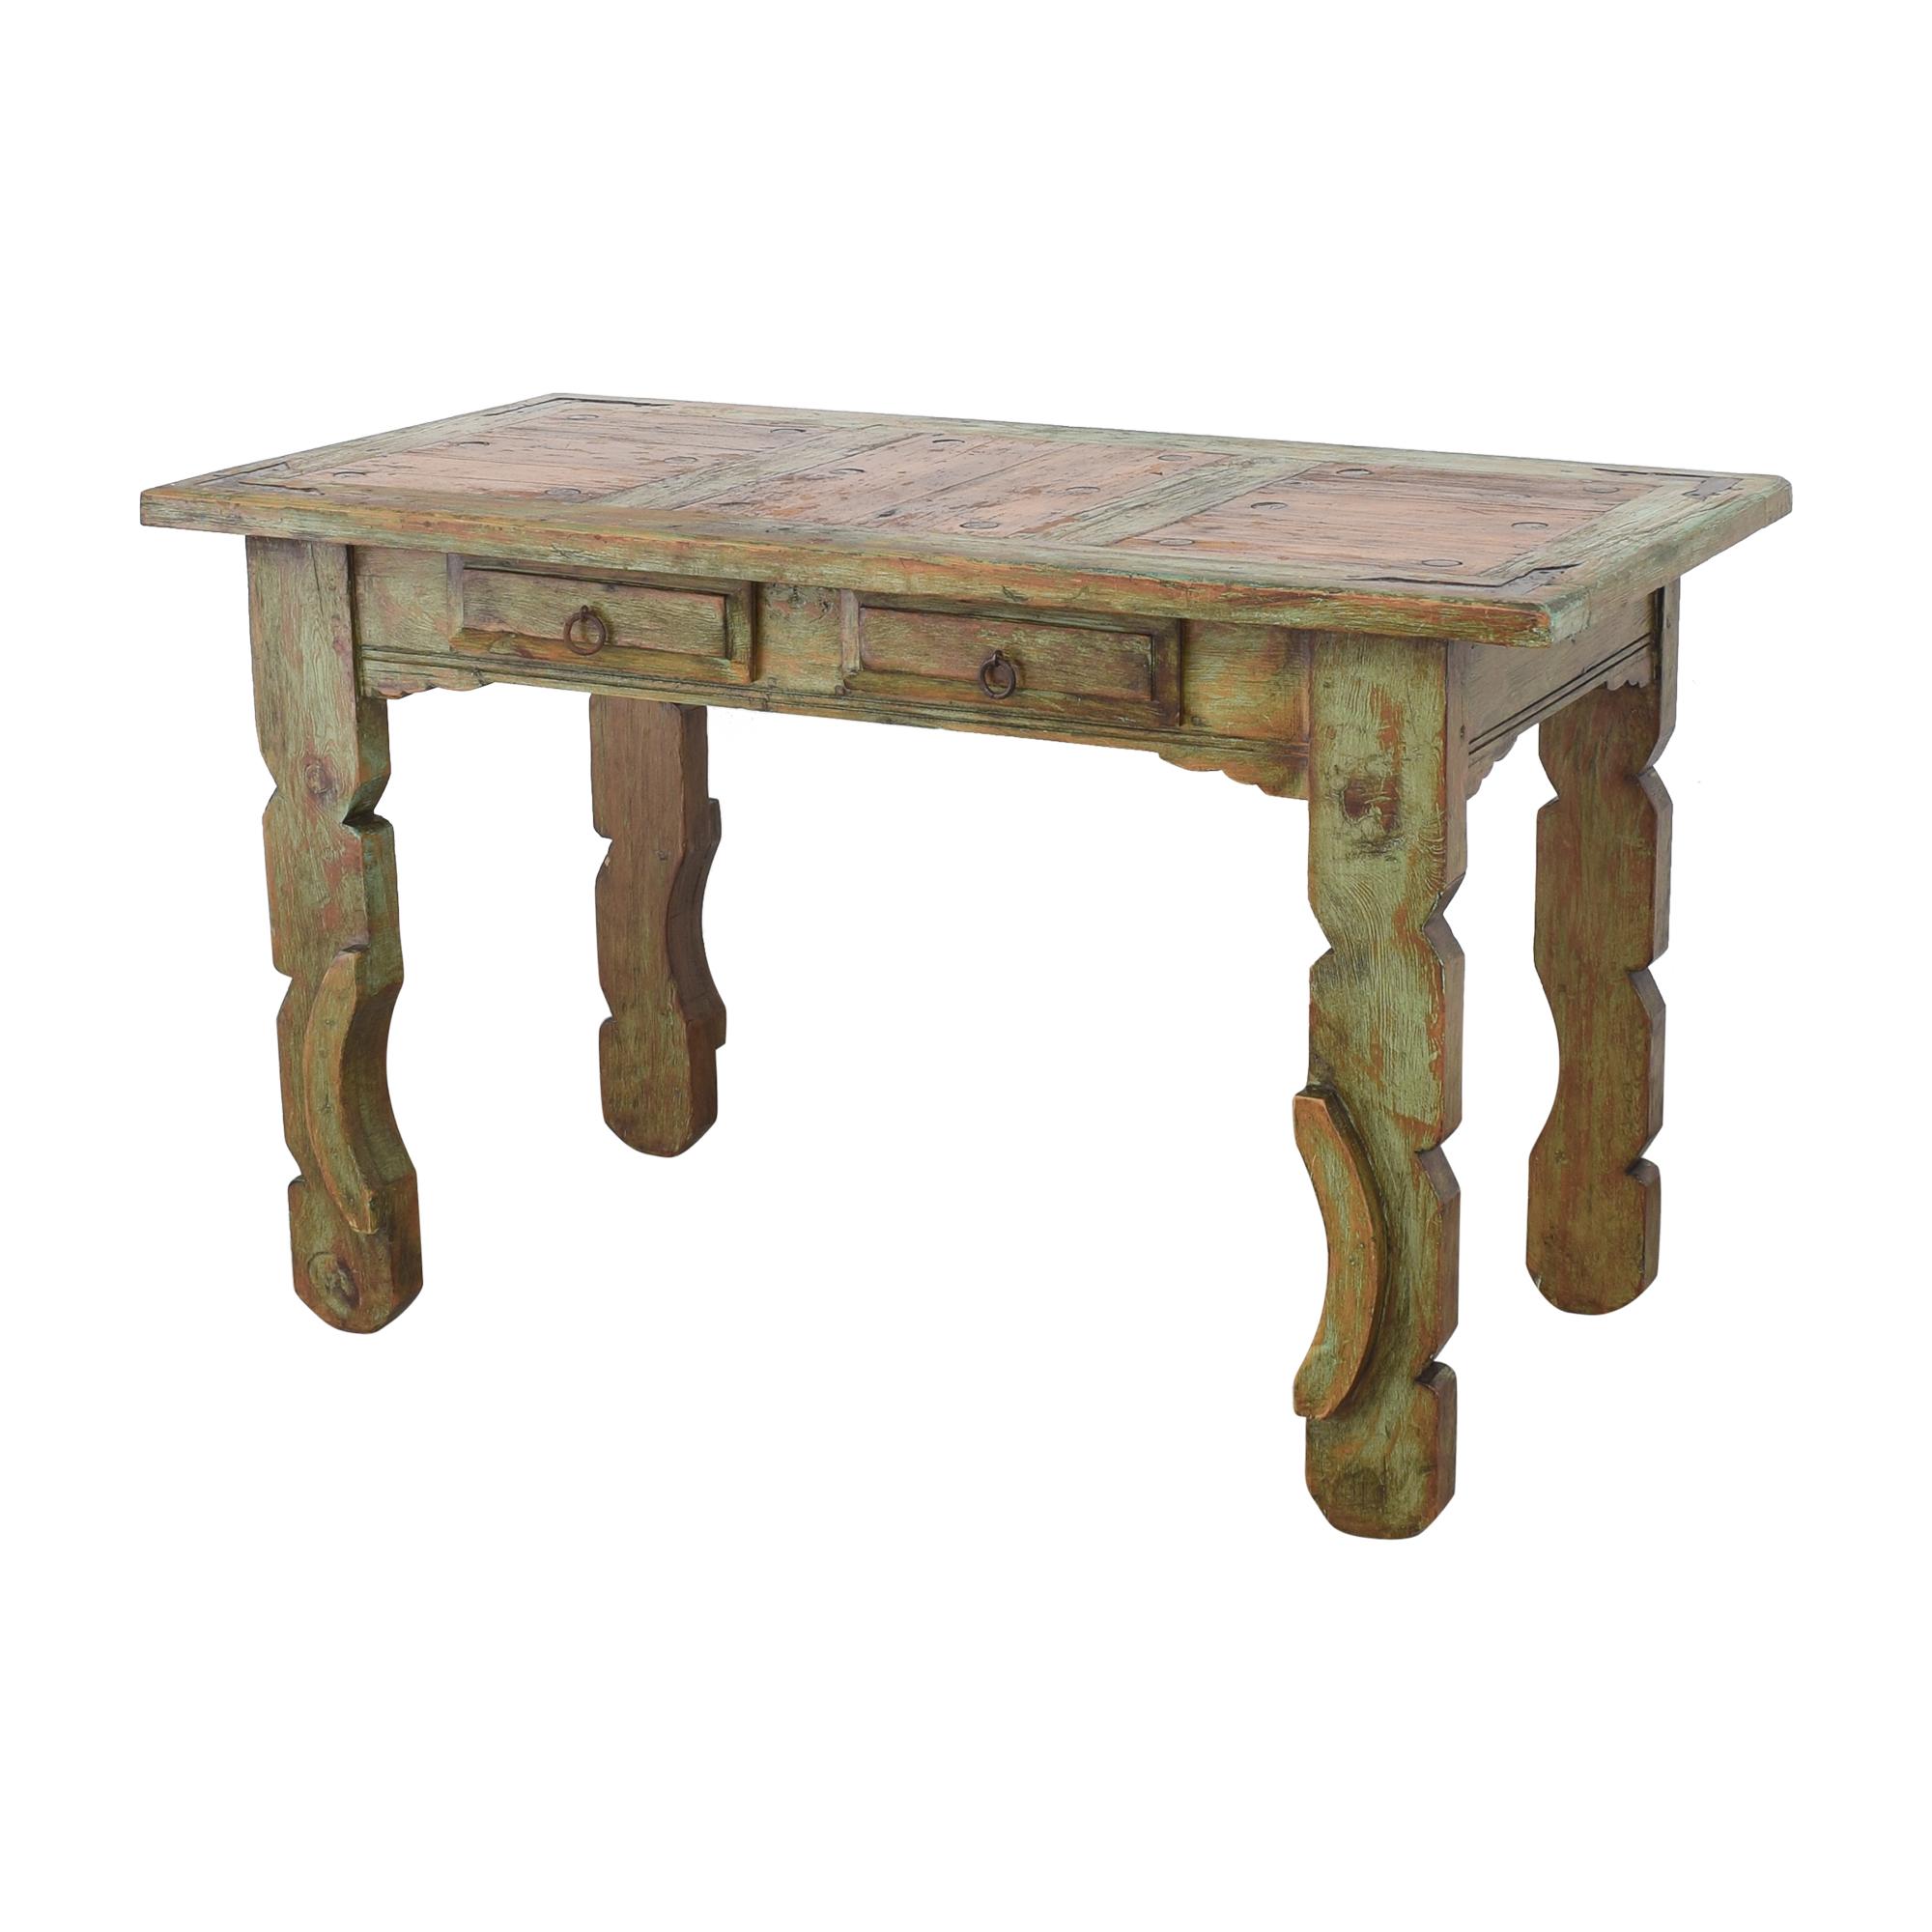 El Barzon Rustic Furniture El Barzon Rustic Furniture Reclaimed Dining Table  used